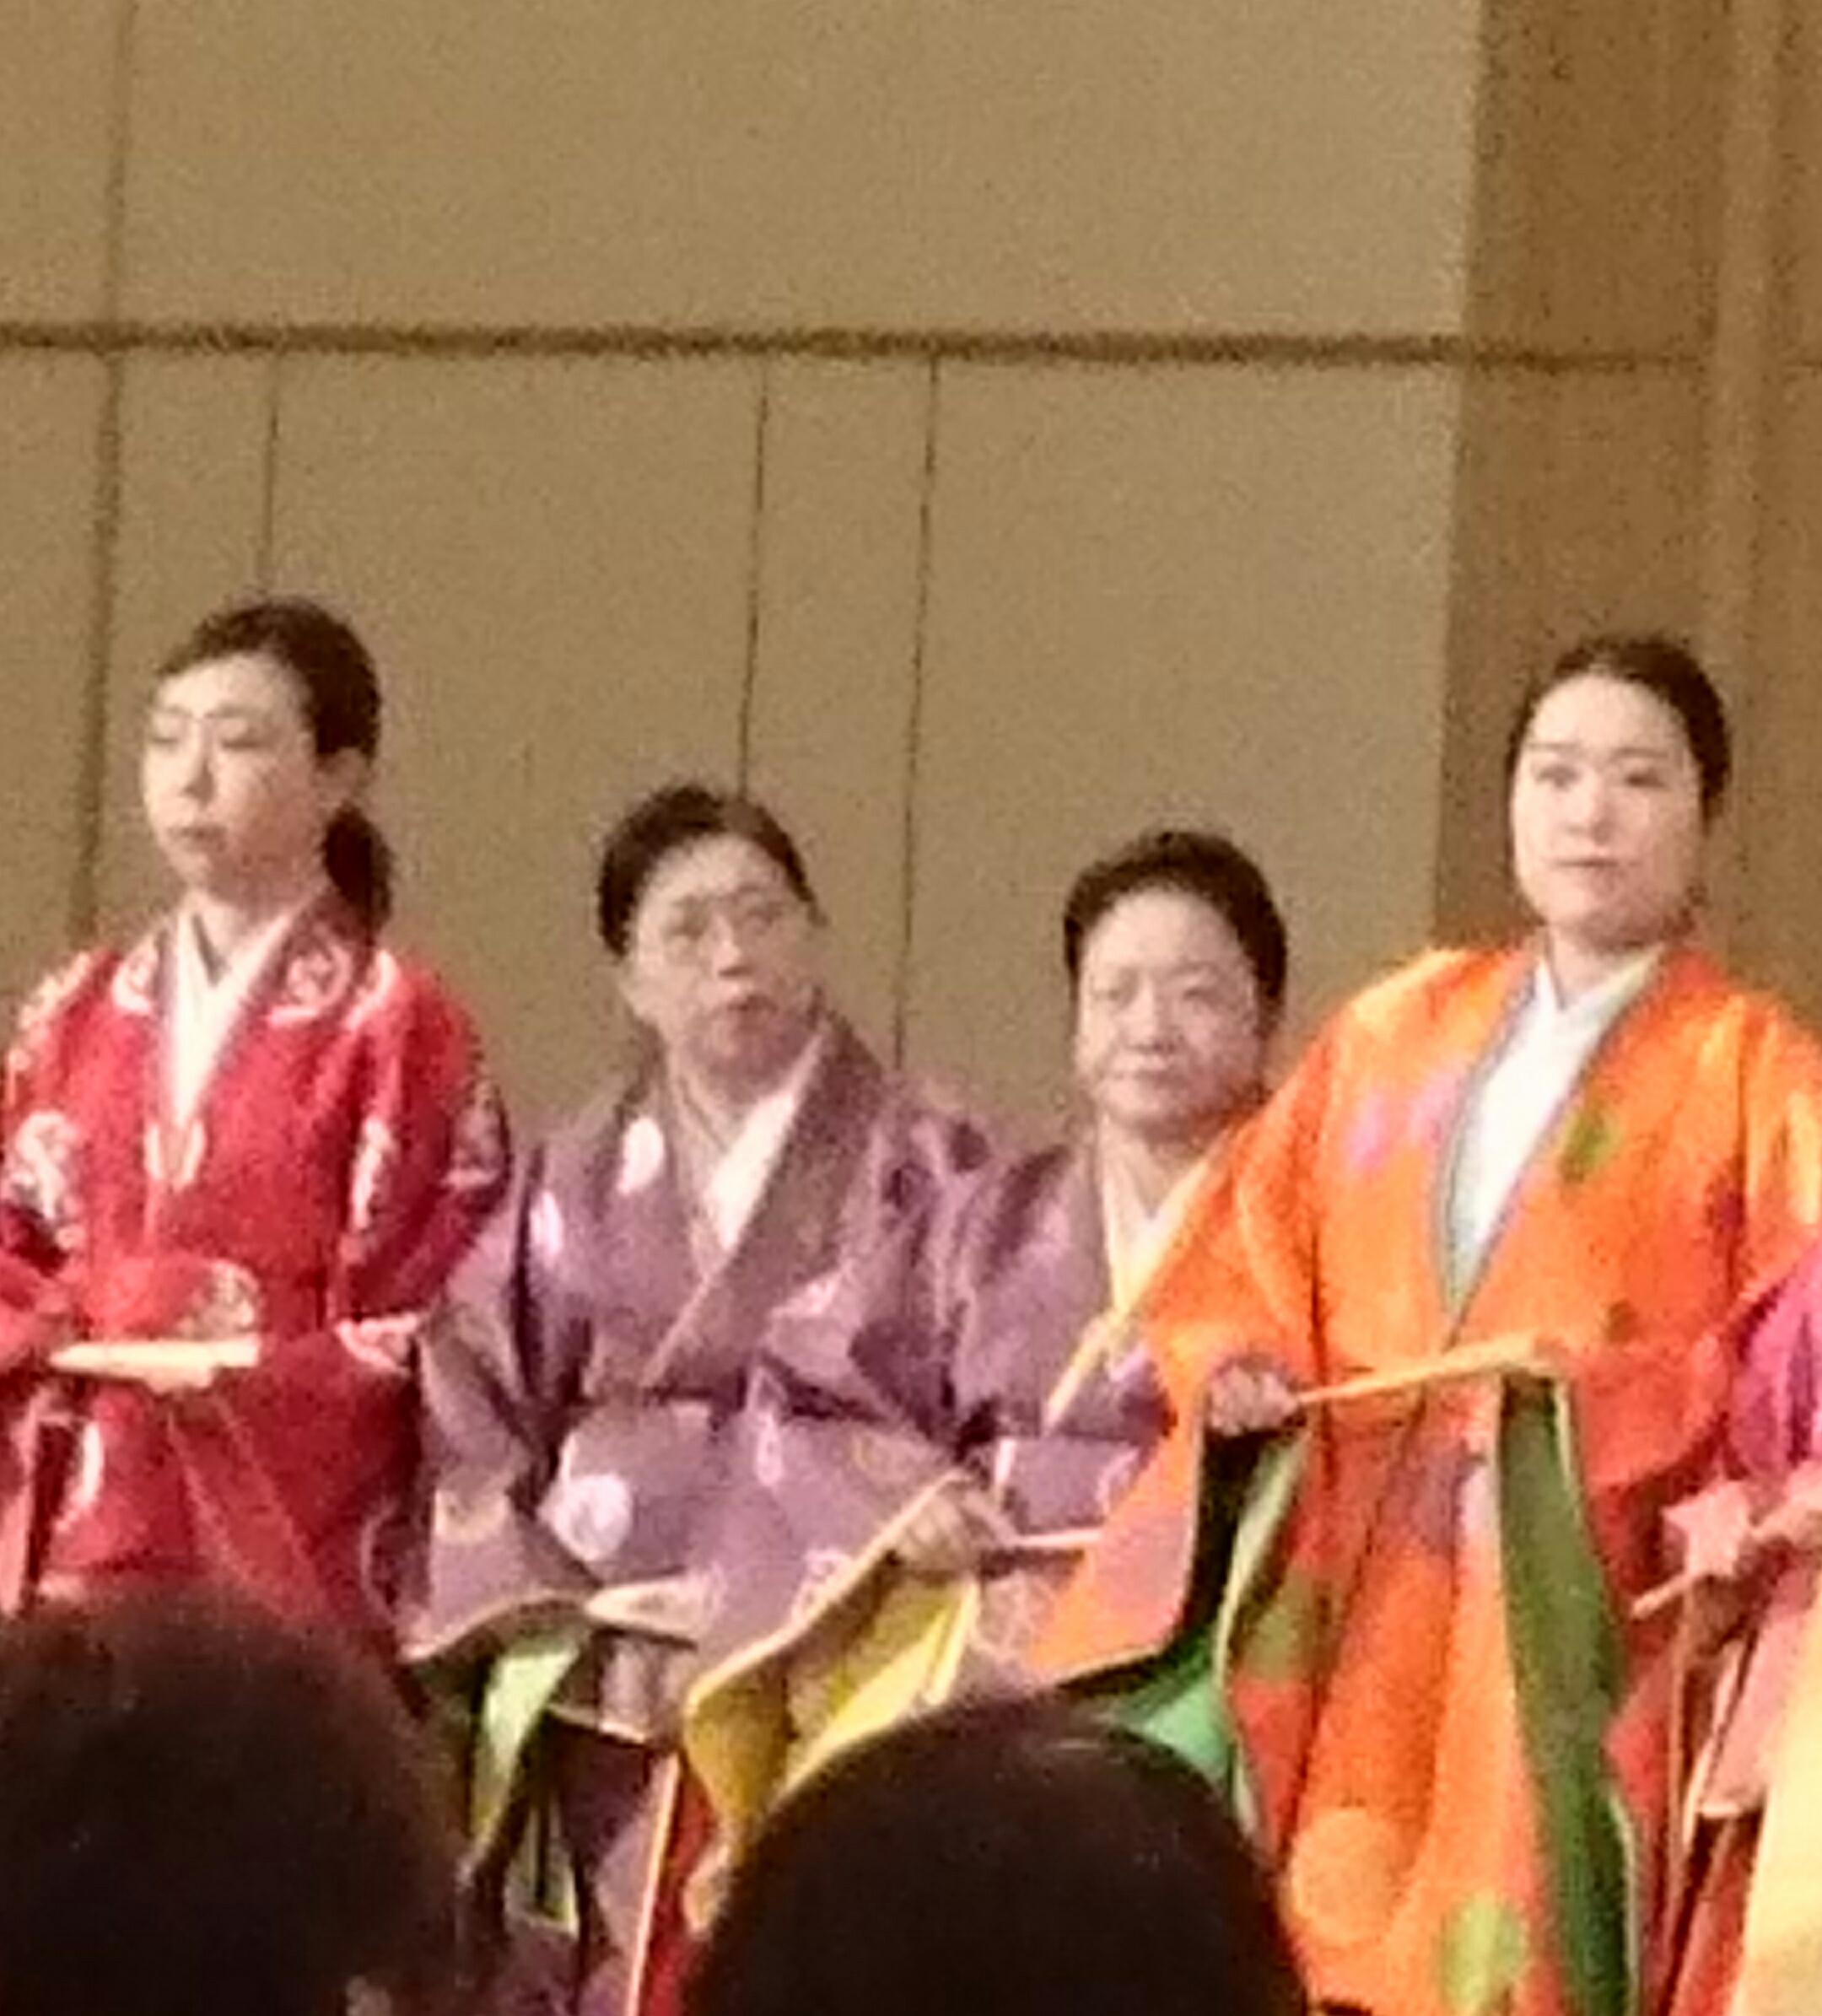 http://kimonokitsuke.com/news/IMG_20181203_174502.JPG